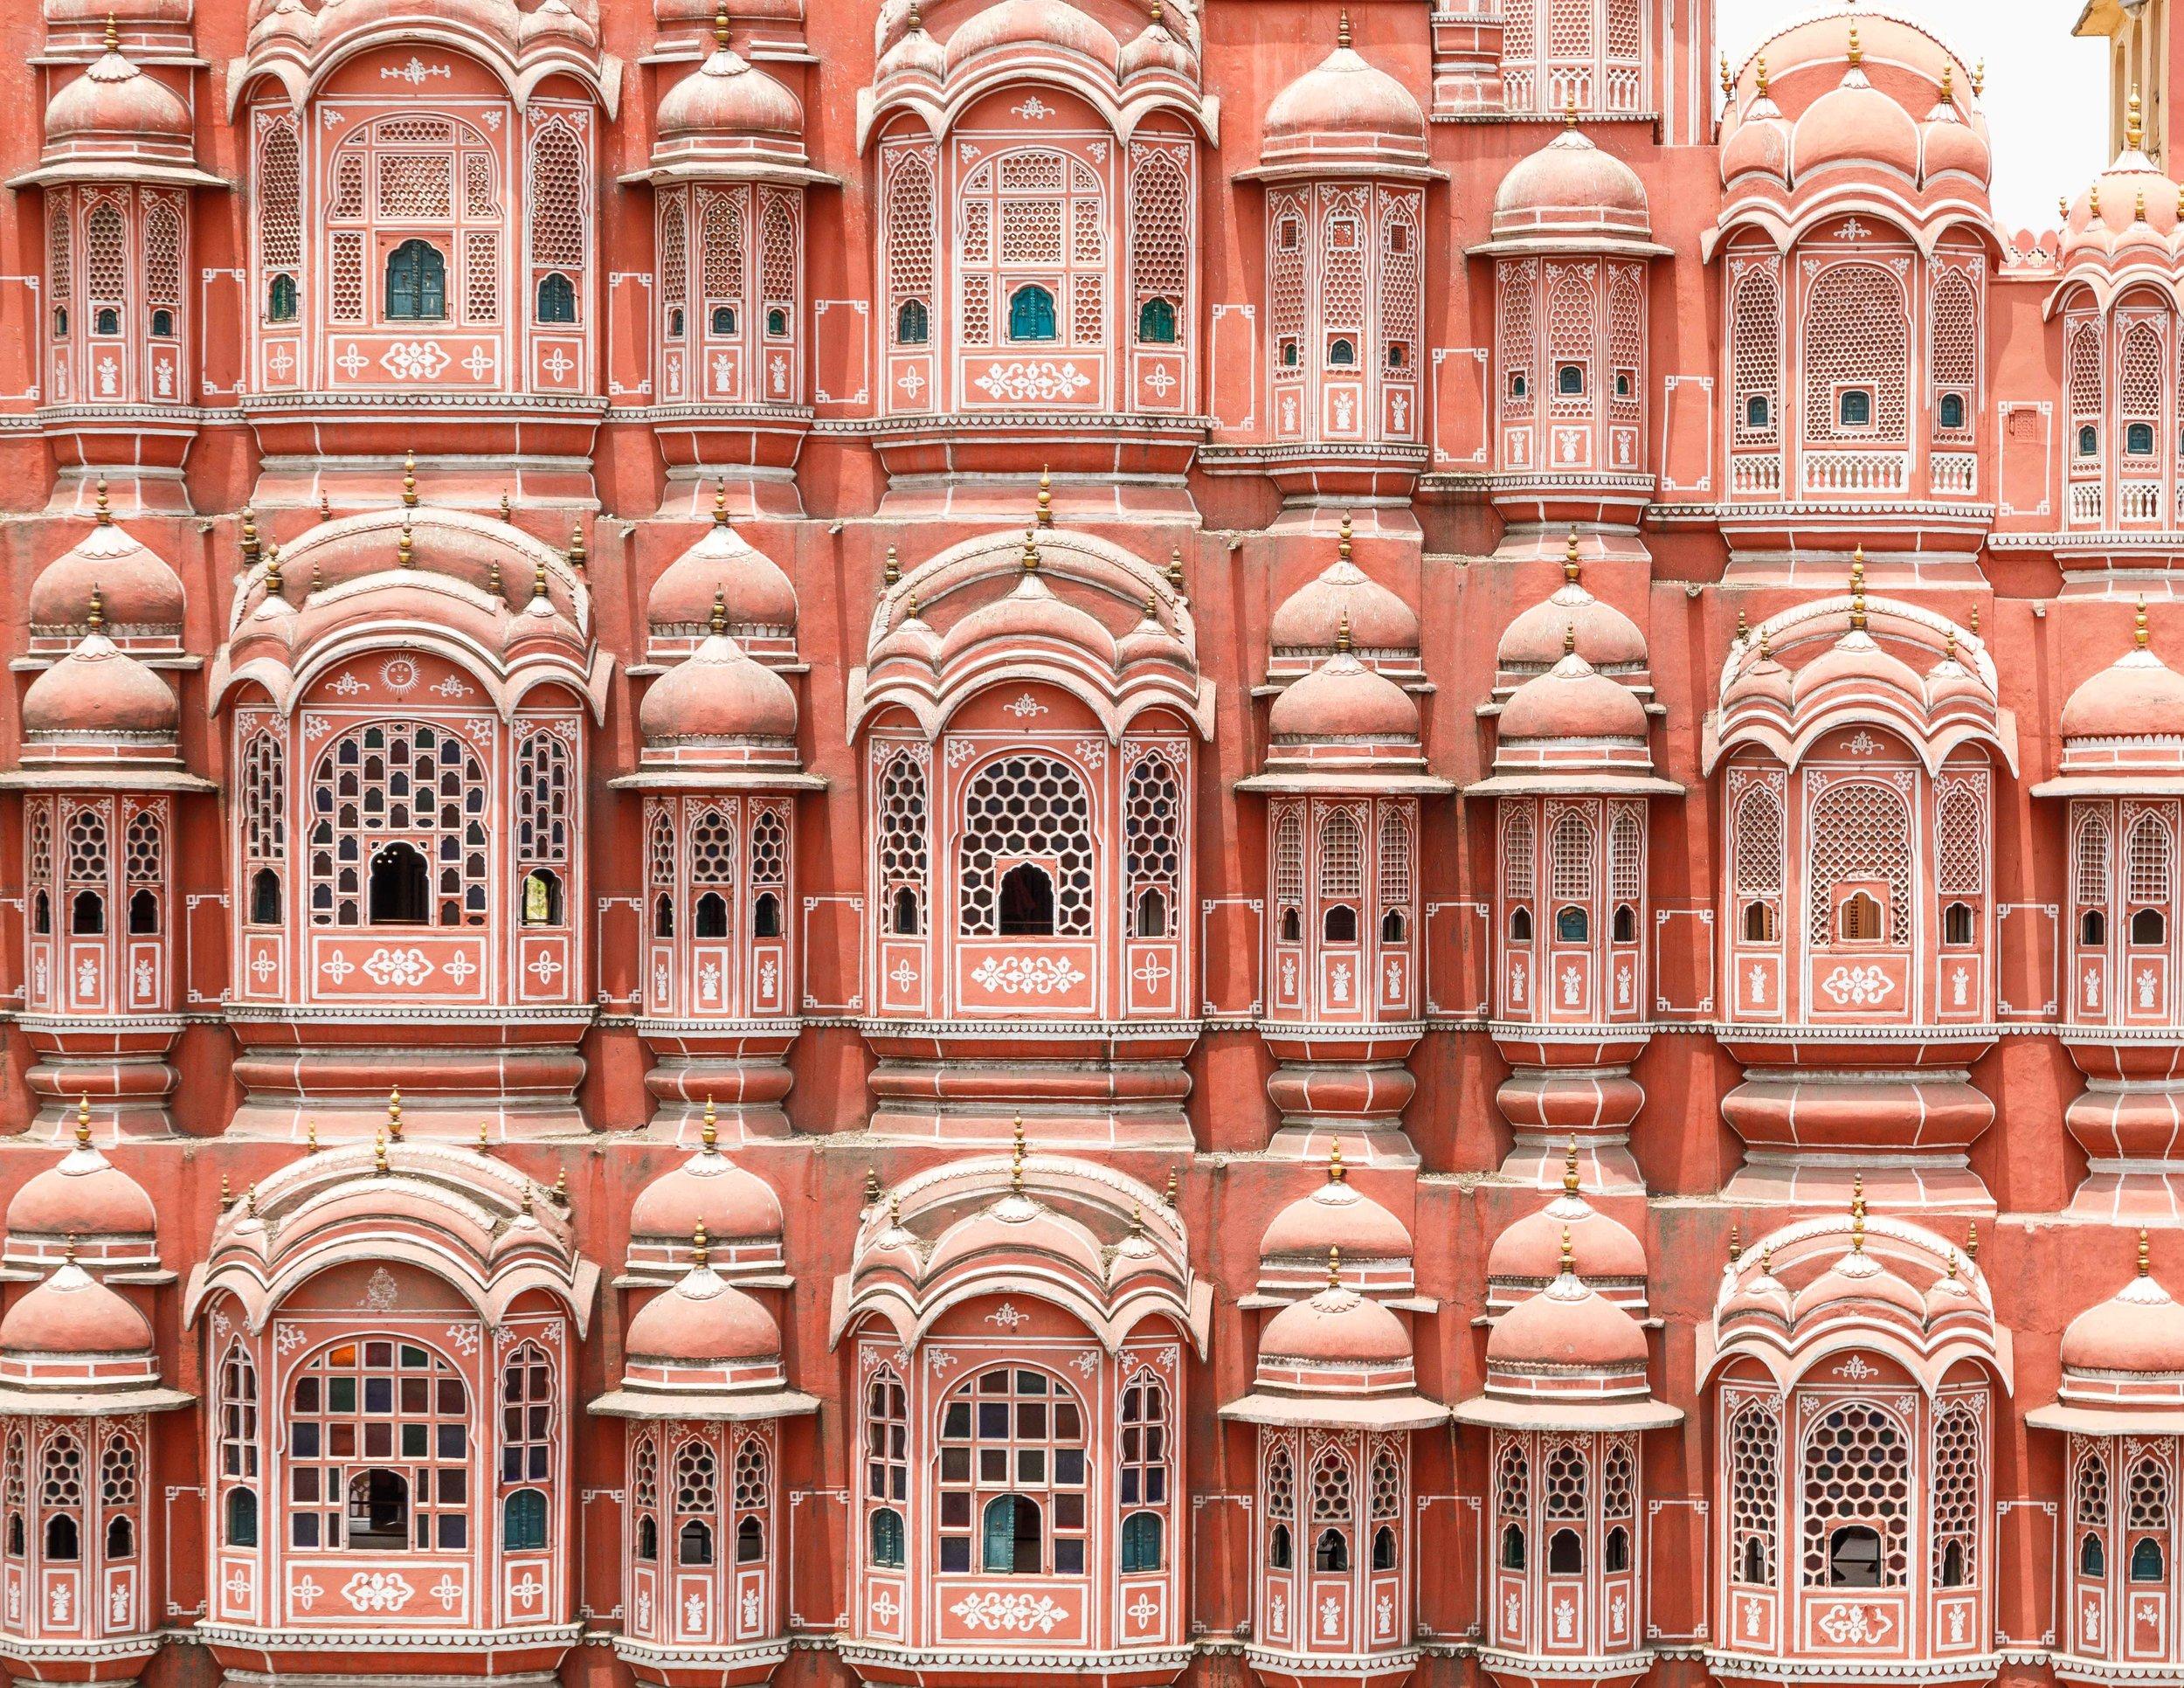 Places to visit in Jaipur: Hawa Mahal